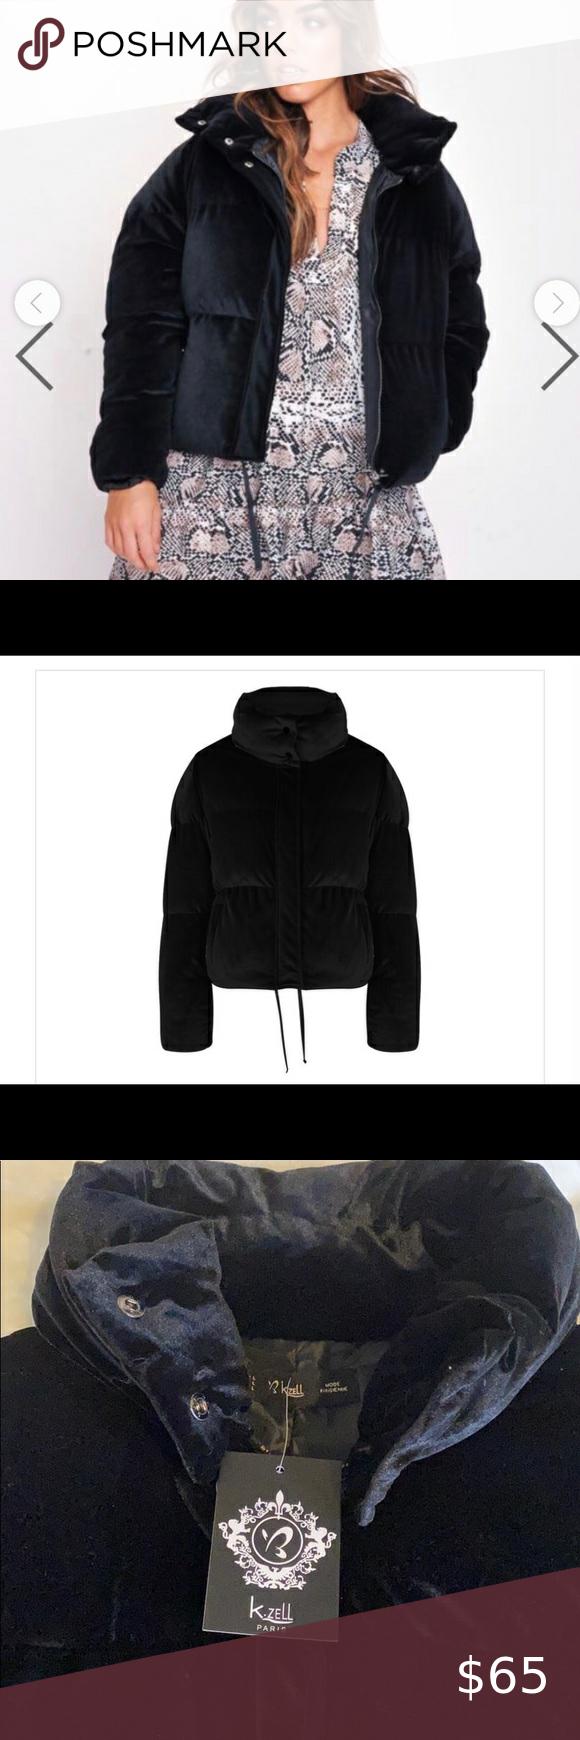 Nwt K Zell Plush Black Velvet Puffer Coat Jacket Jackets Clothes Design Puffer Coat [ 1740 x 580 Pixel ]